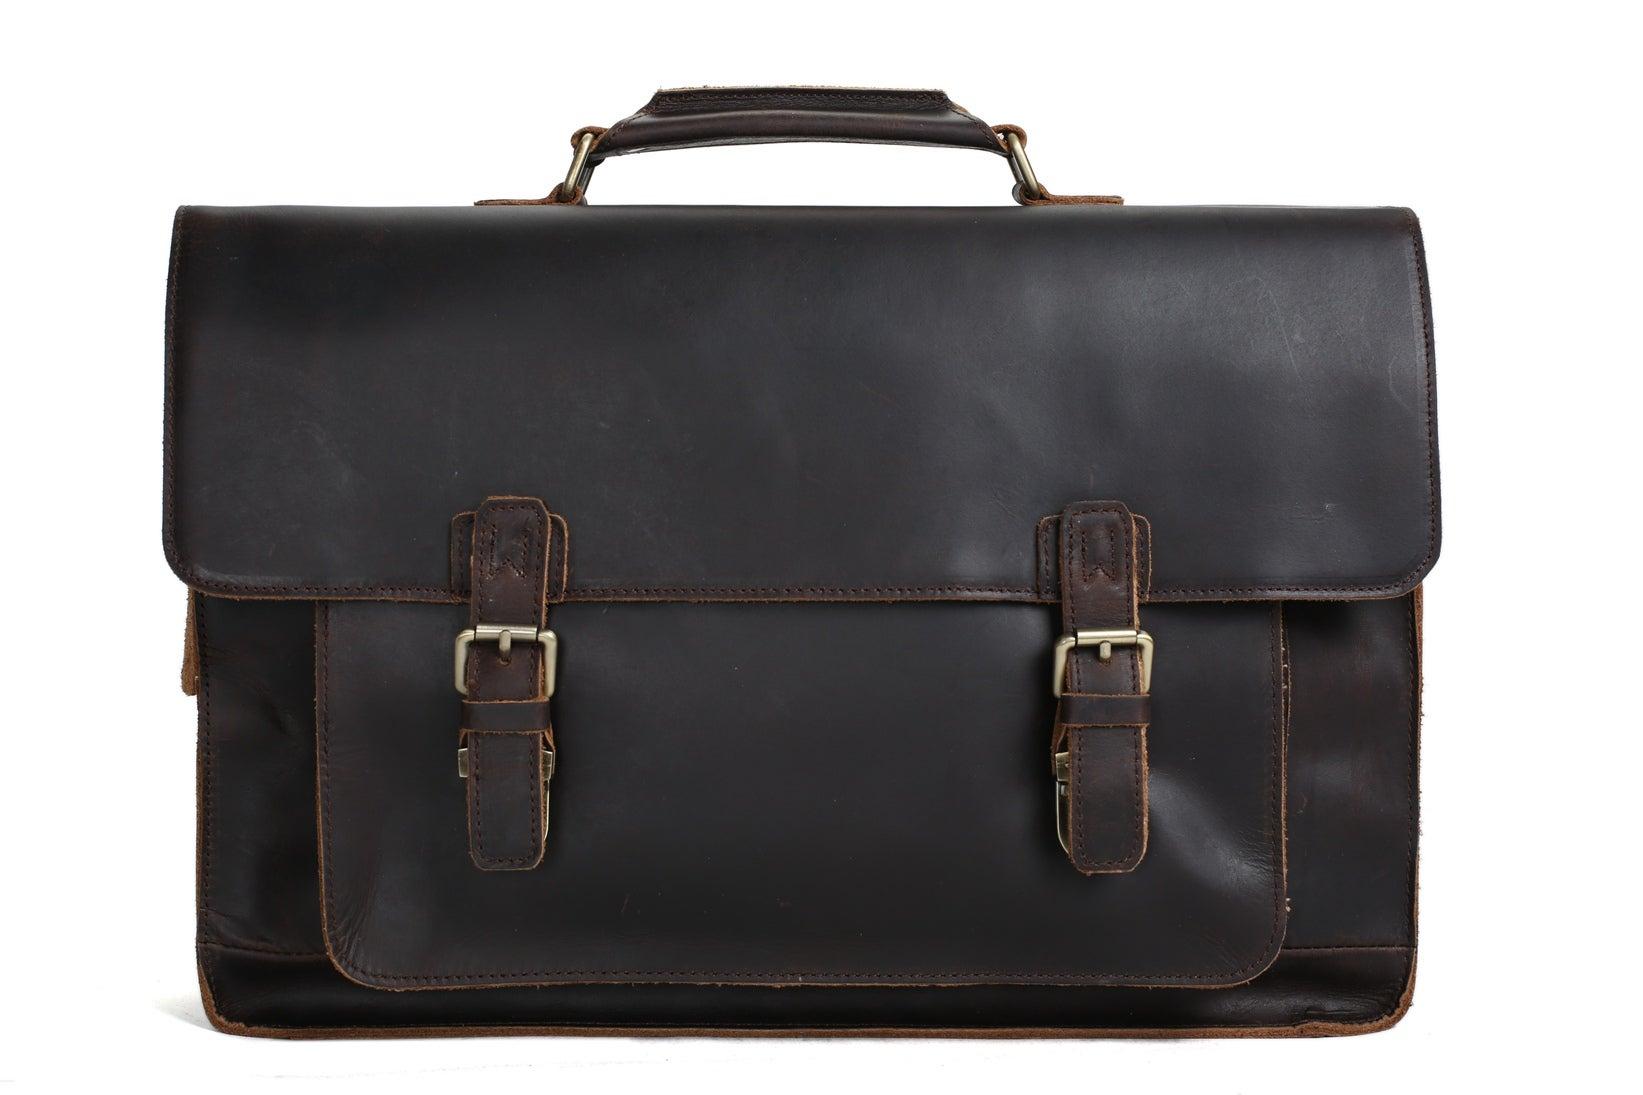 MoshiLeatherBag - Handmade Leather Bag Manufacturer — 17 ...